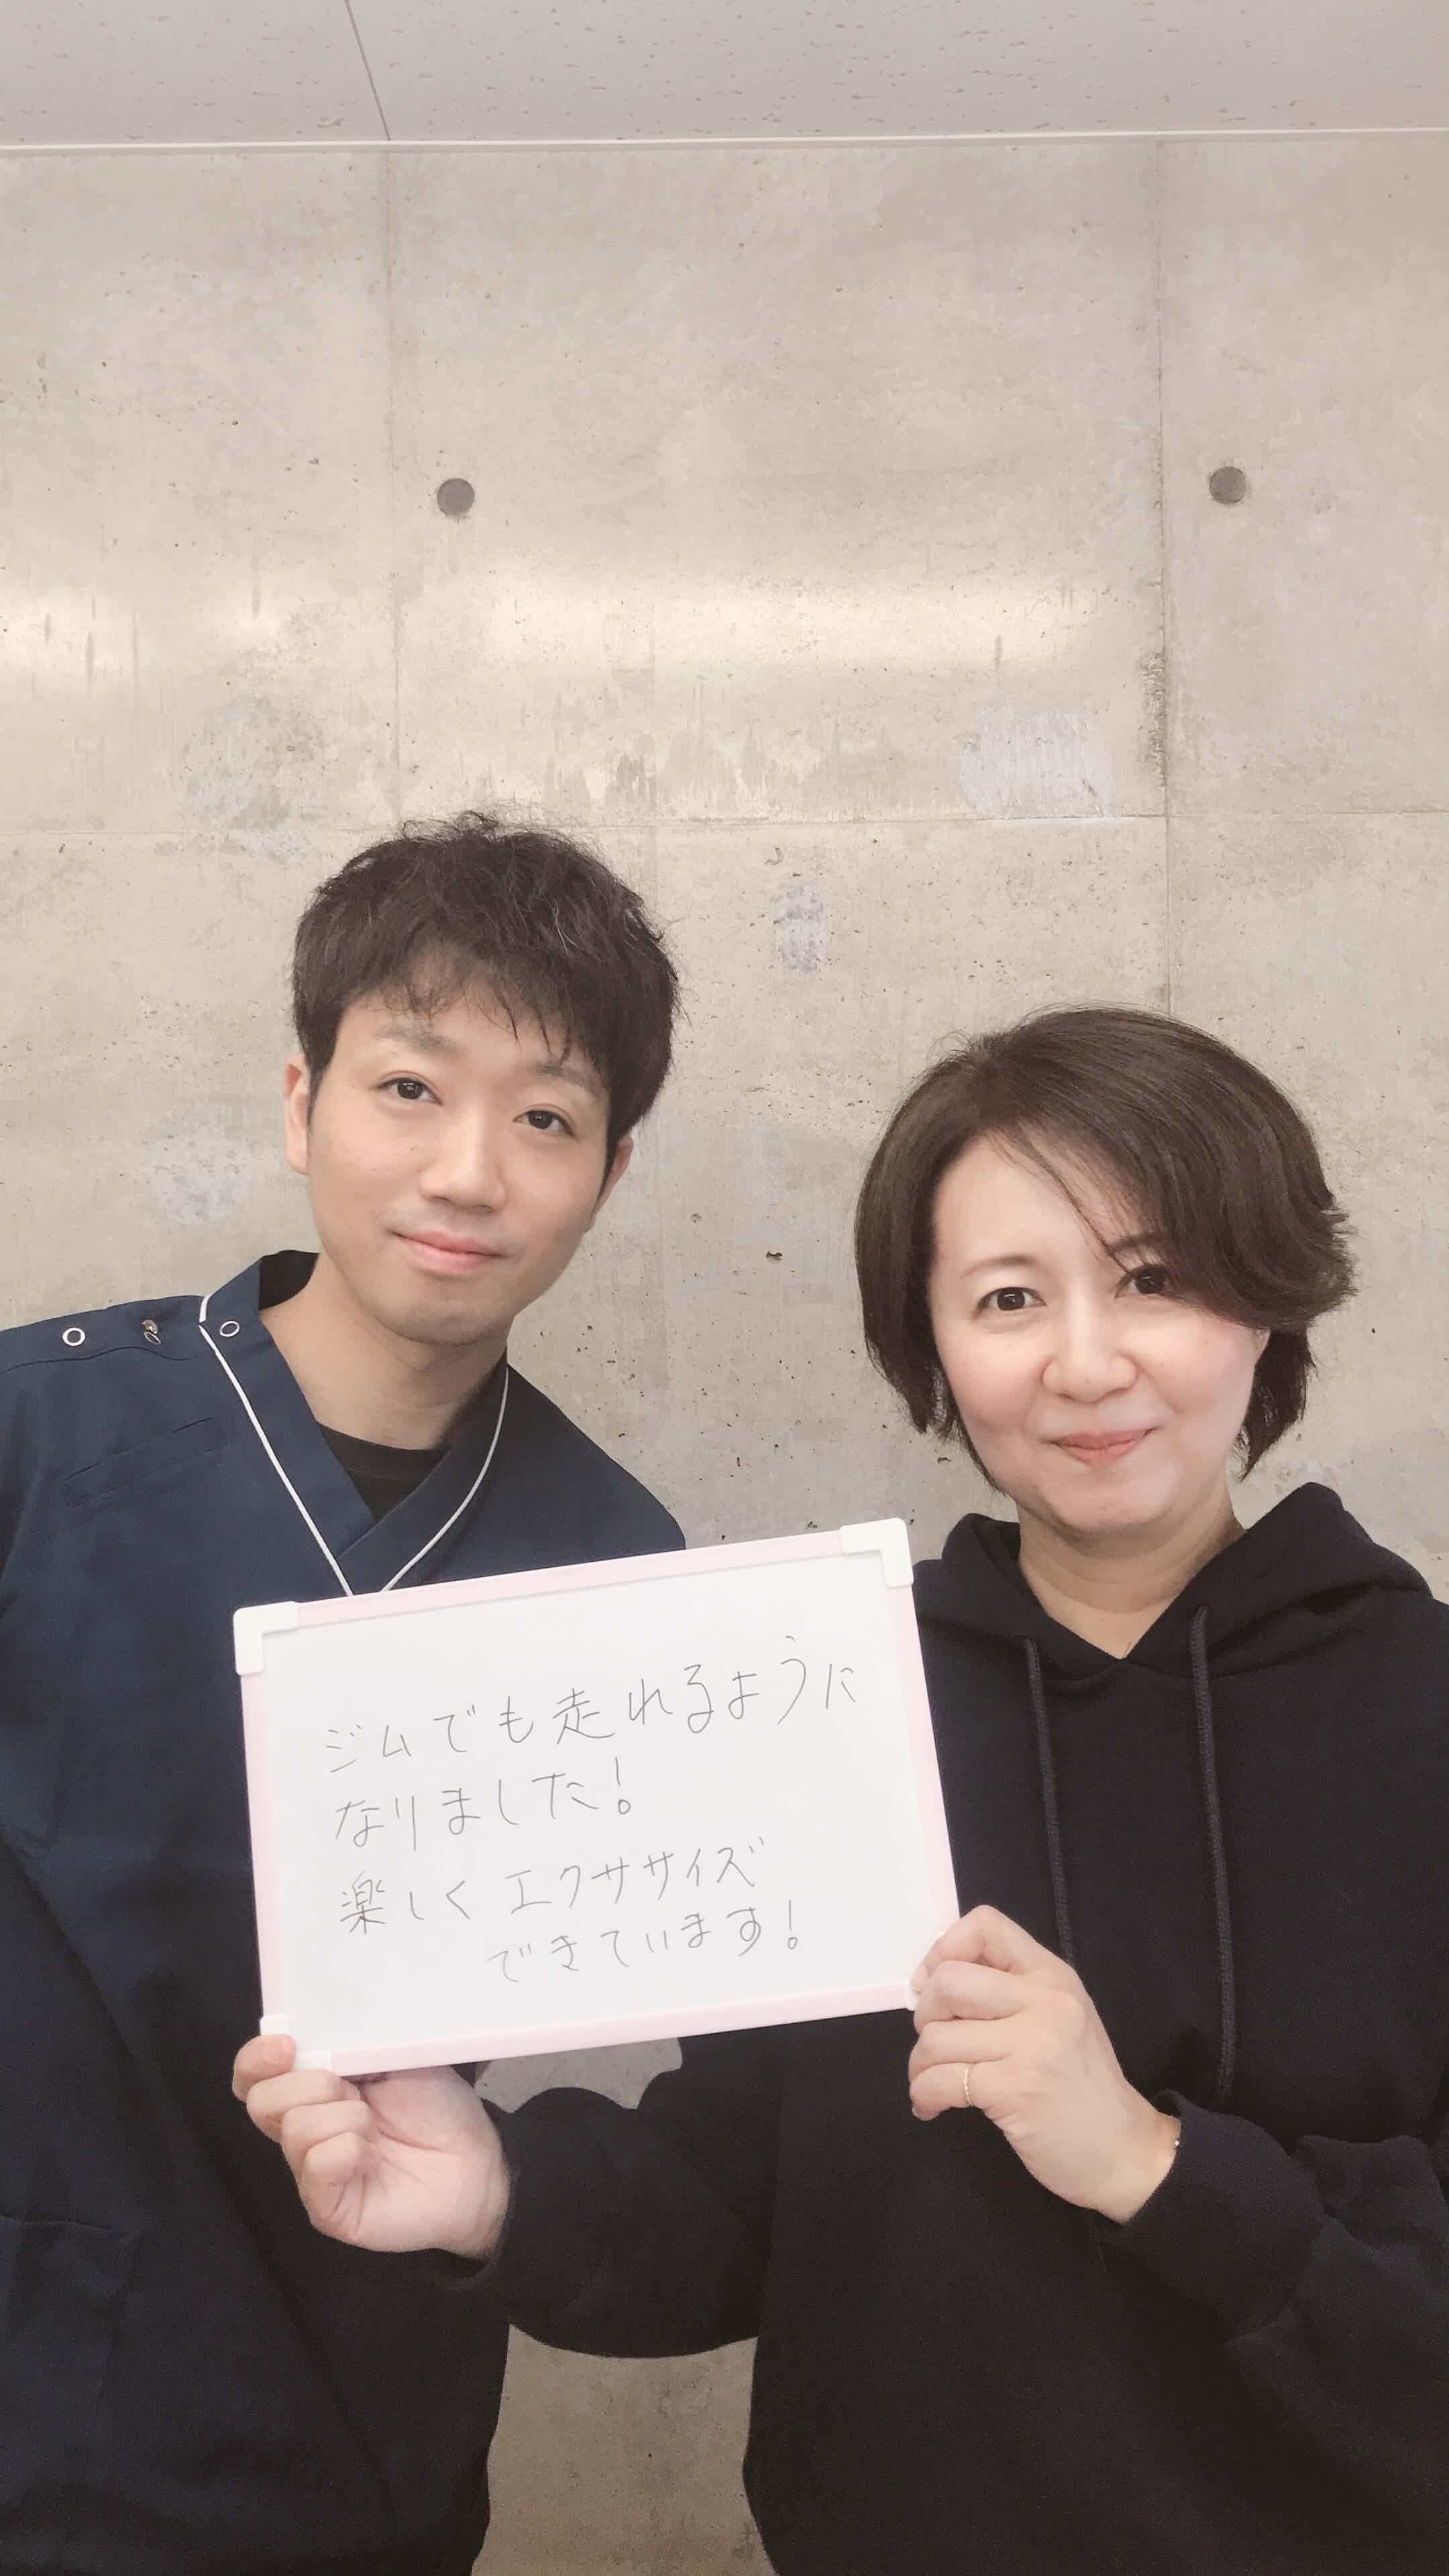 S 様 (埼玉県)